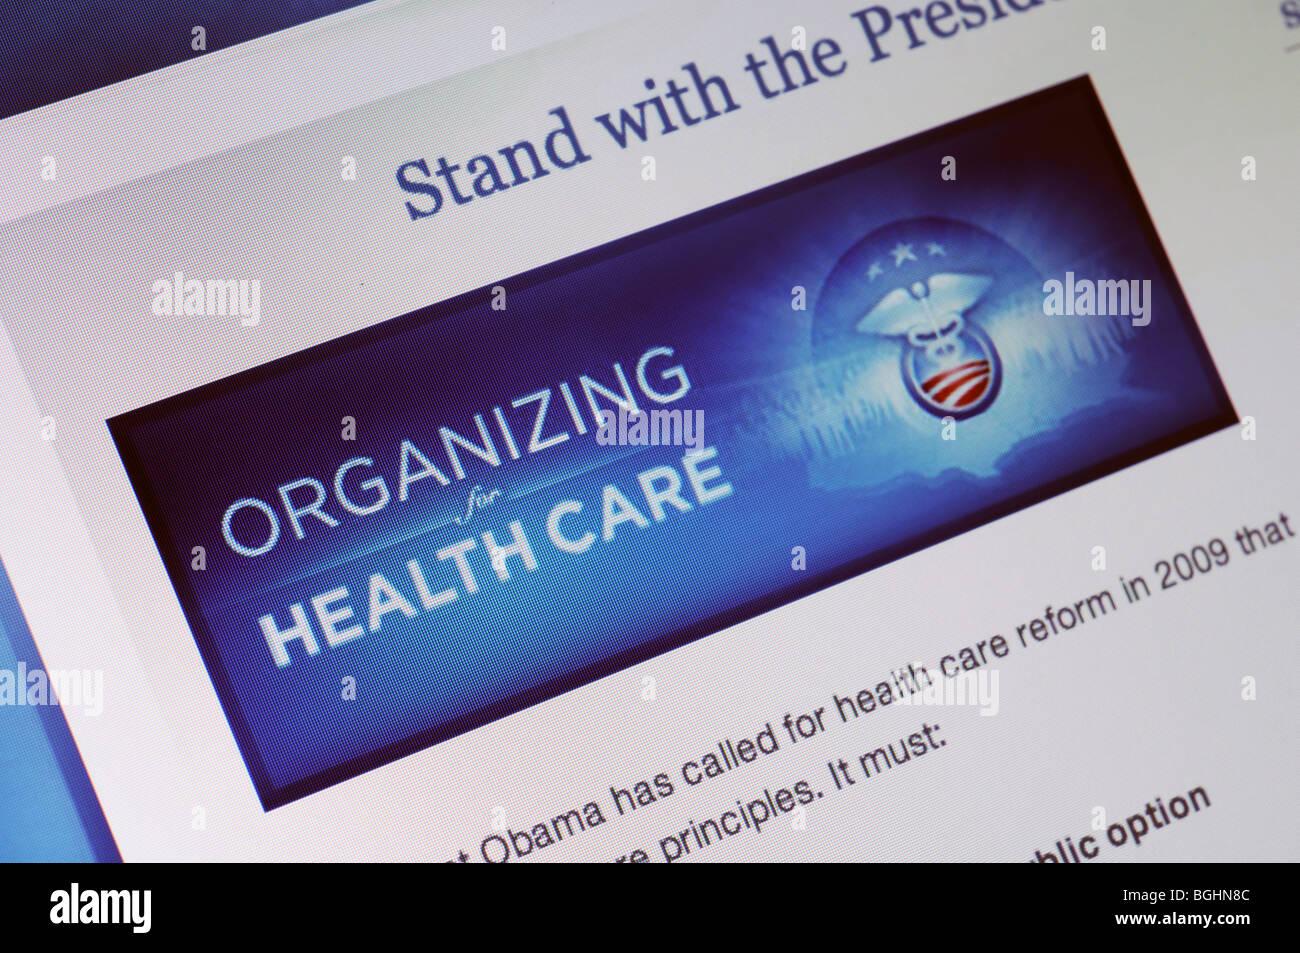 US-Gesundheitswesen-website Stockbild